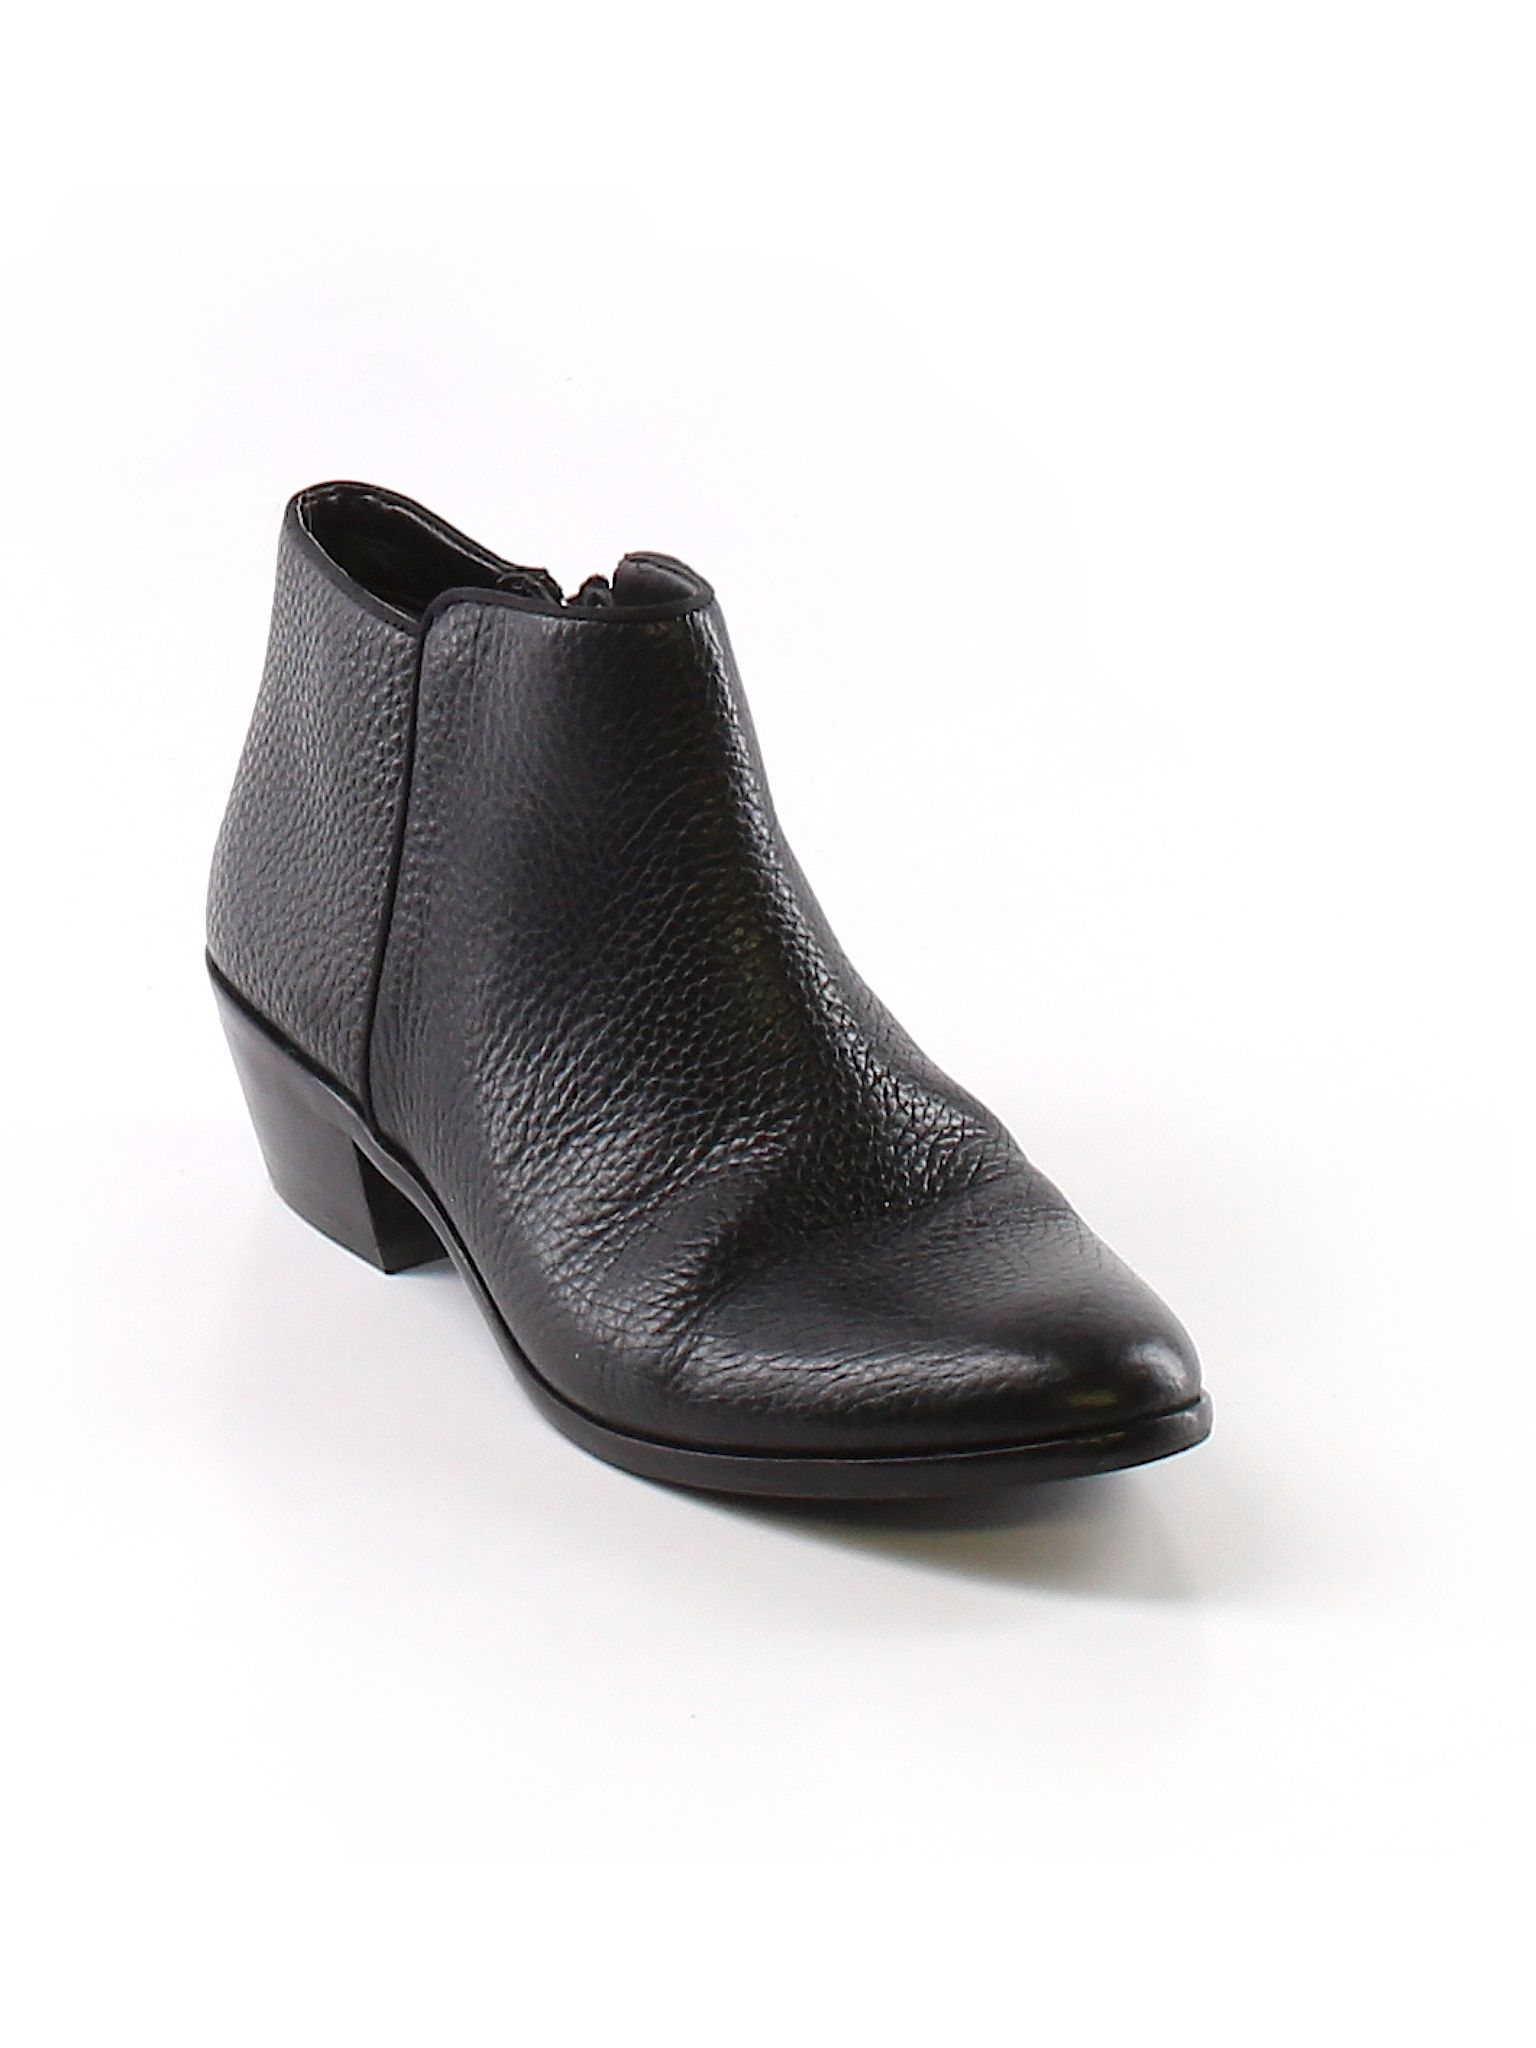 77abf9f1841845 Sam Edelman Ankle Boots  Size 7 1 2 Black Women s Shoes -  28.99